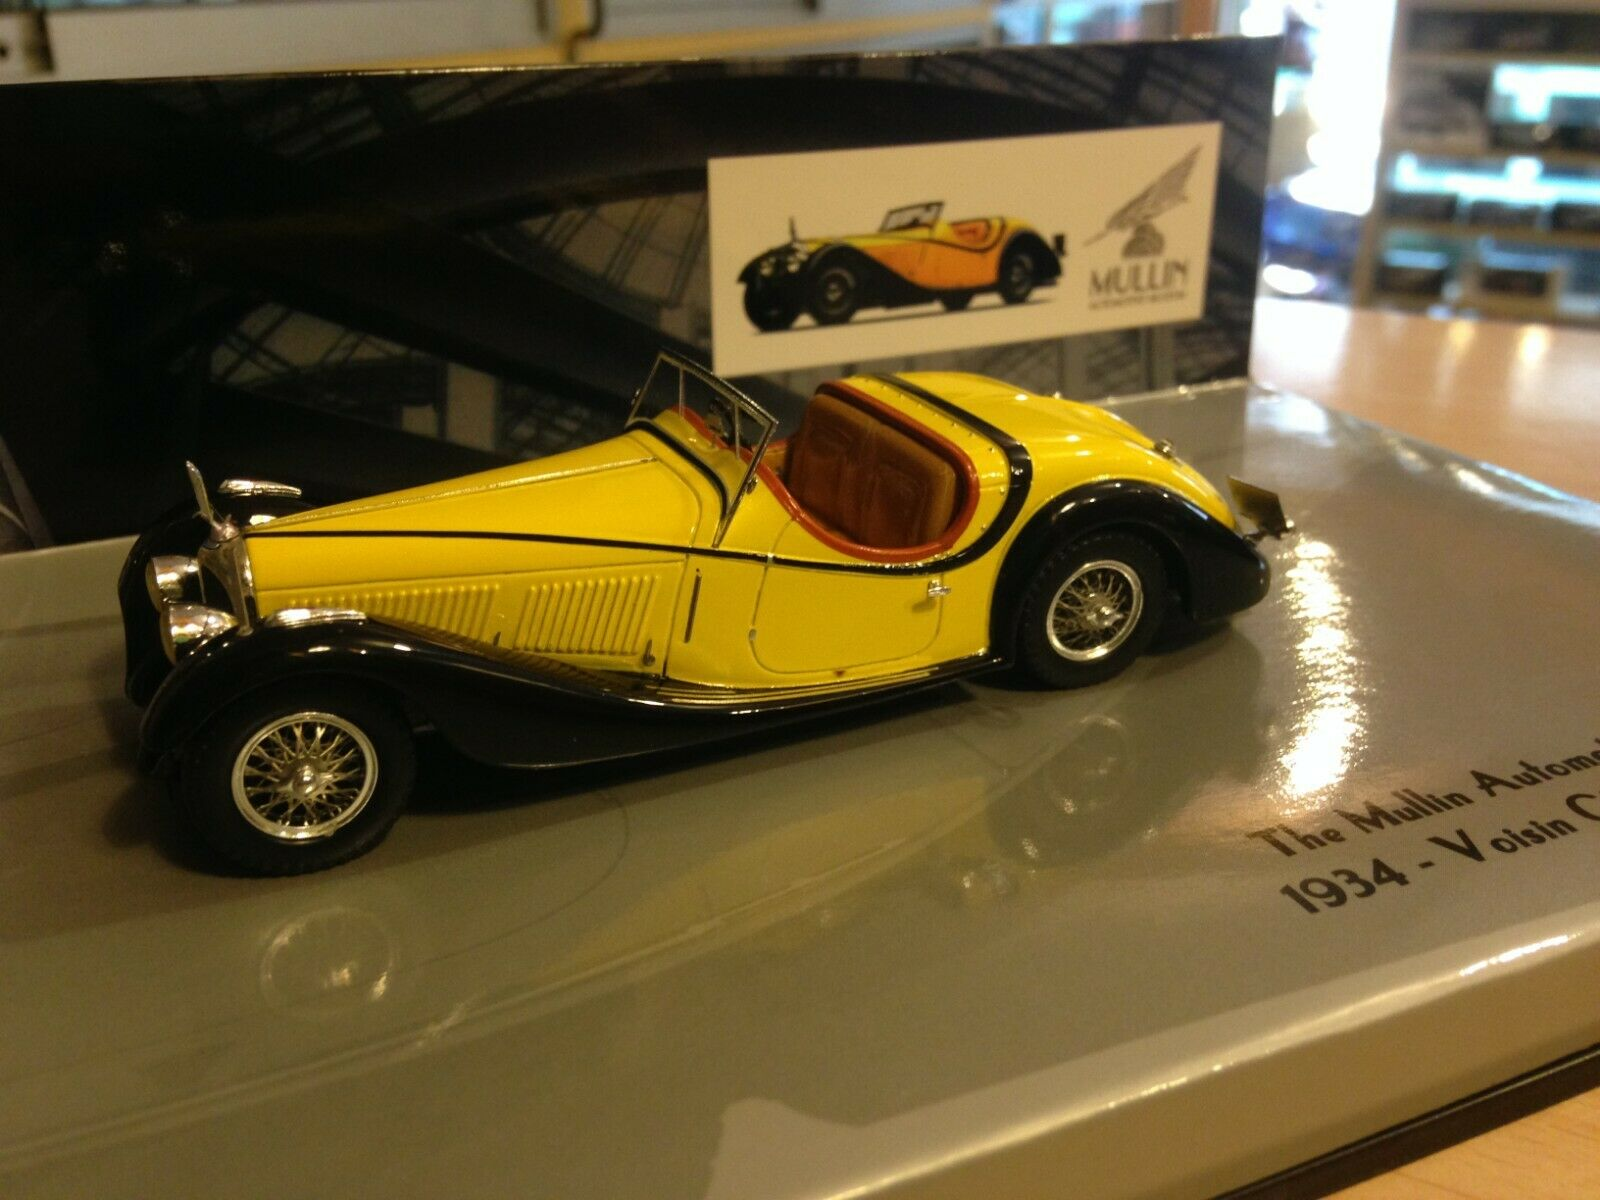 Voisin c27 grand sport congreenible 1934 1 43 minichamps yellow & black